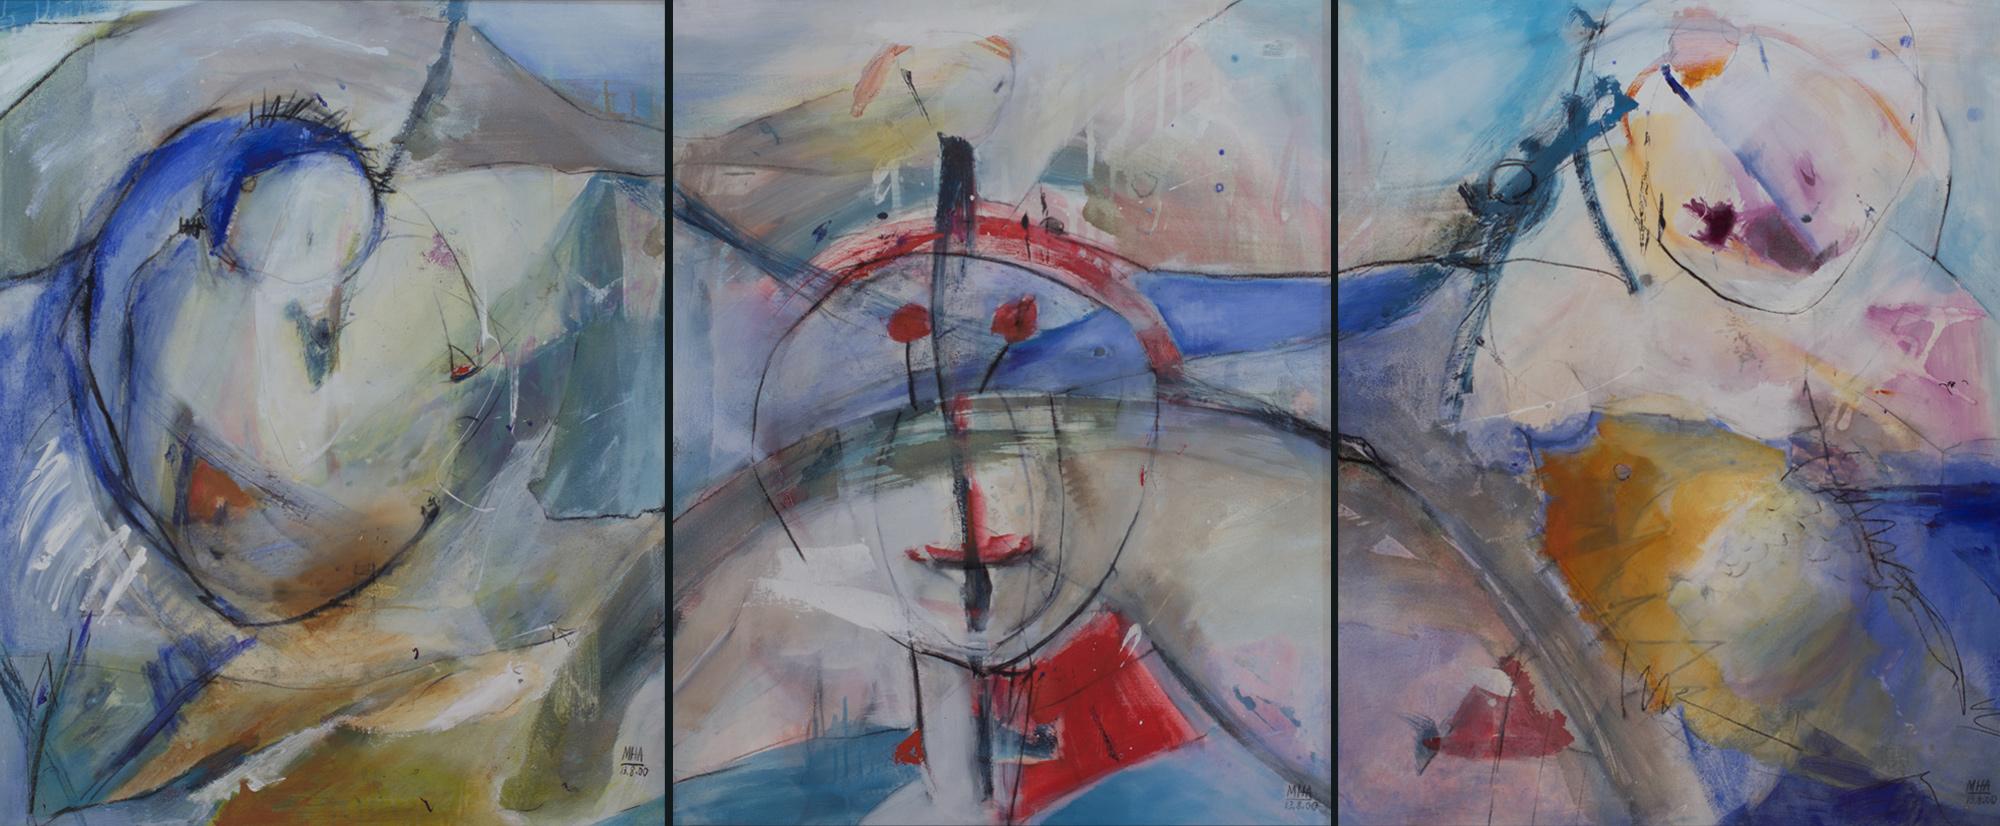 Triptychon:   Gestern,Heute,Morgen ,2000, Acryl auf Leinwand, je 80x100 cm